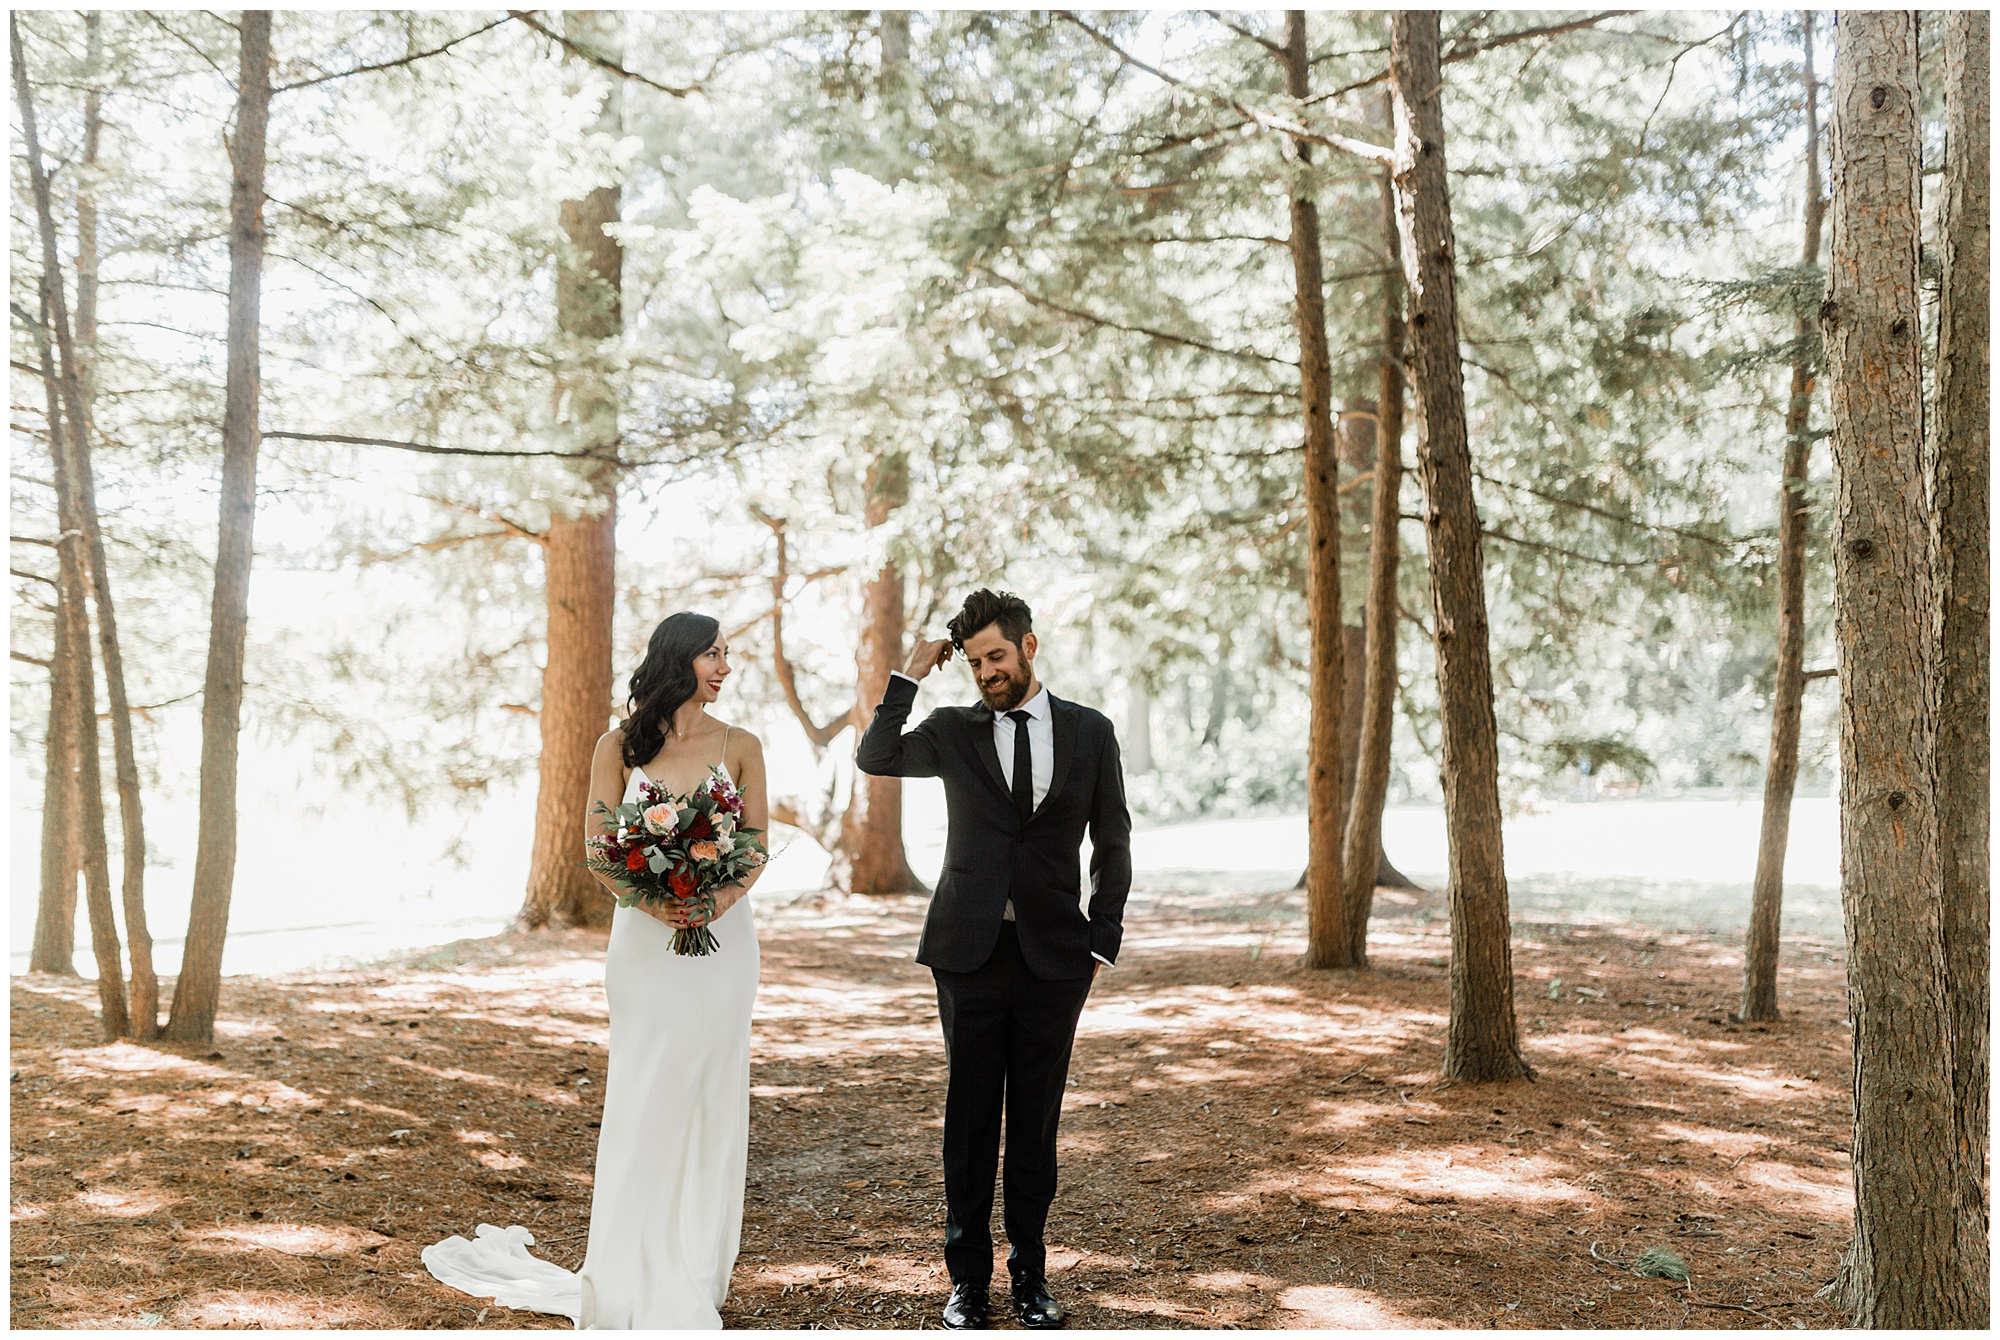 allerton_park_wedding_champaign_il_chicago_wright_photographs_ne_0069.jpg